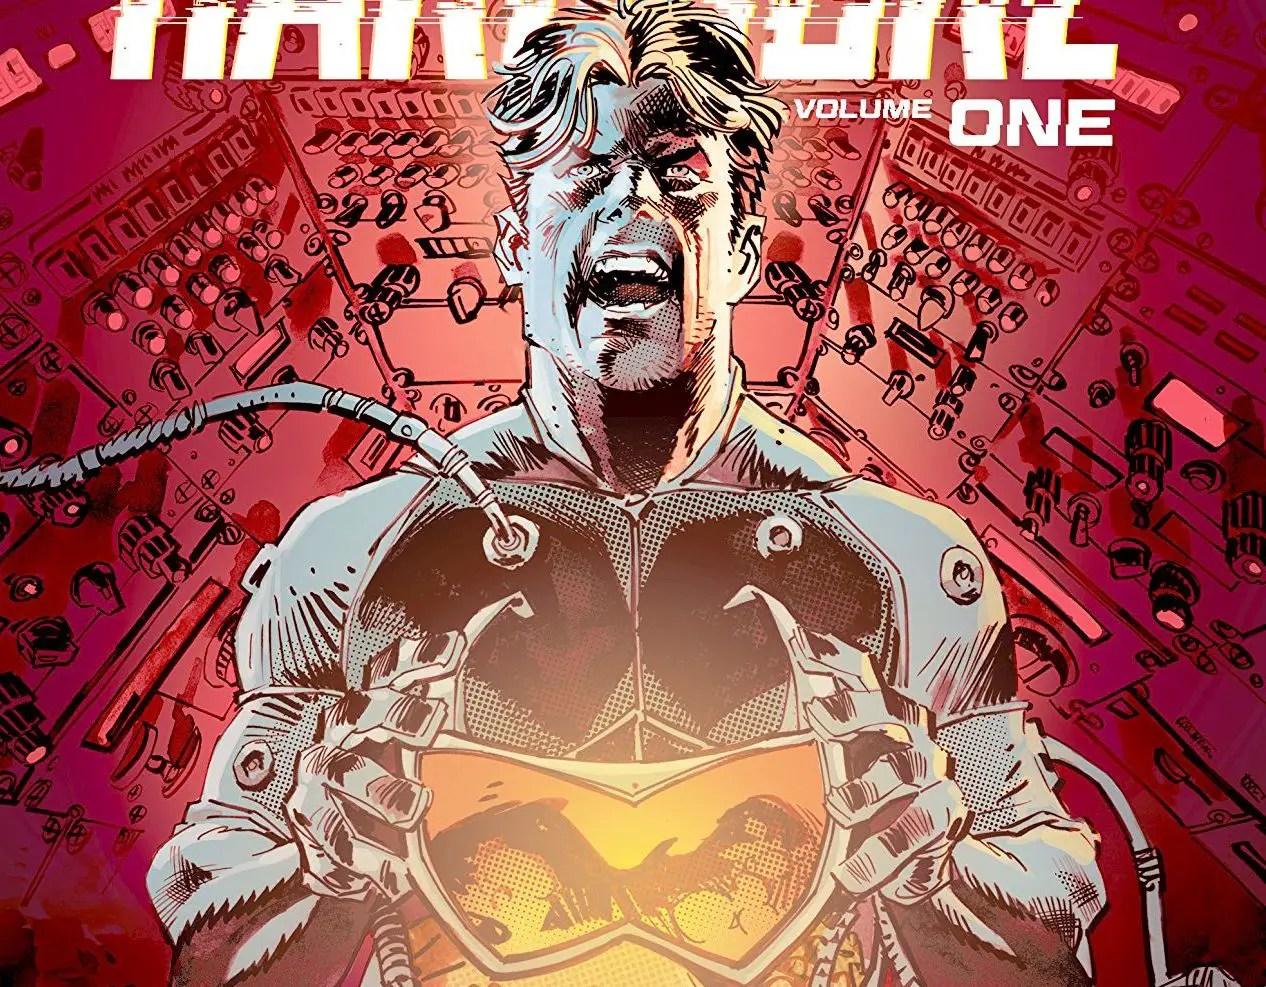 Hardcore Vol. 1 Review